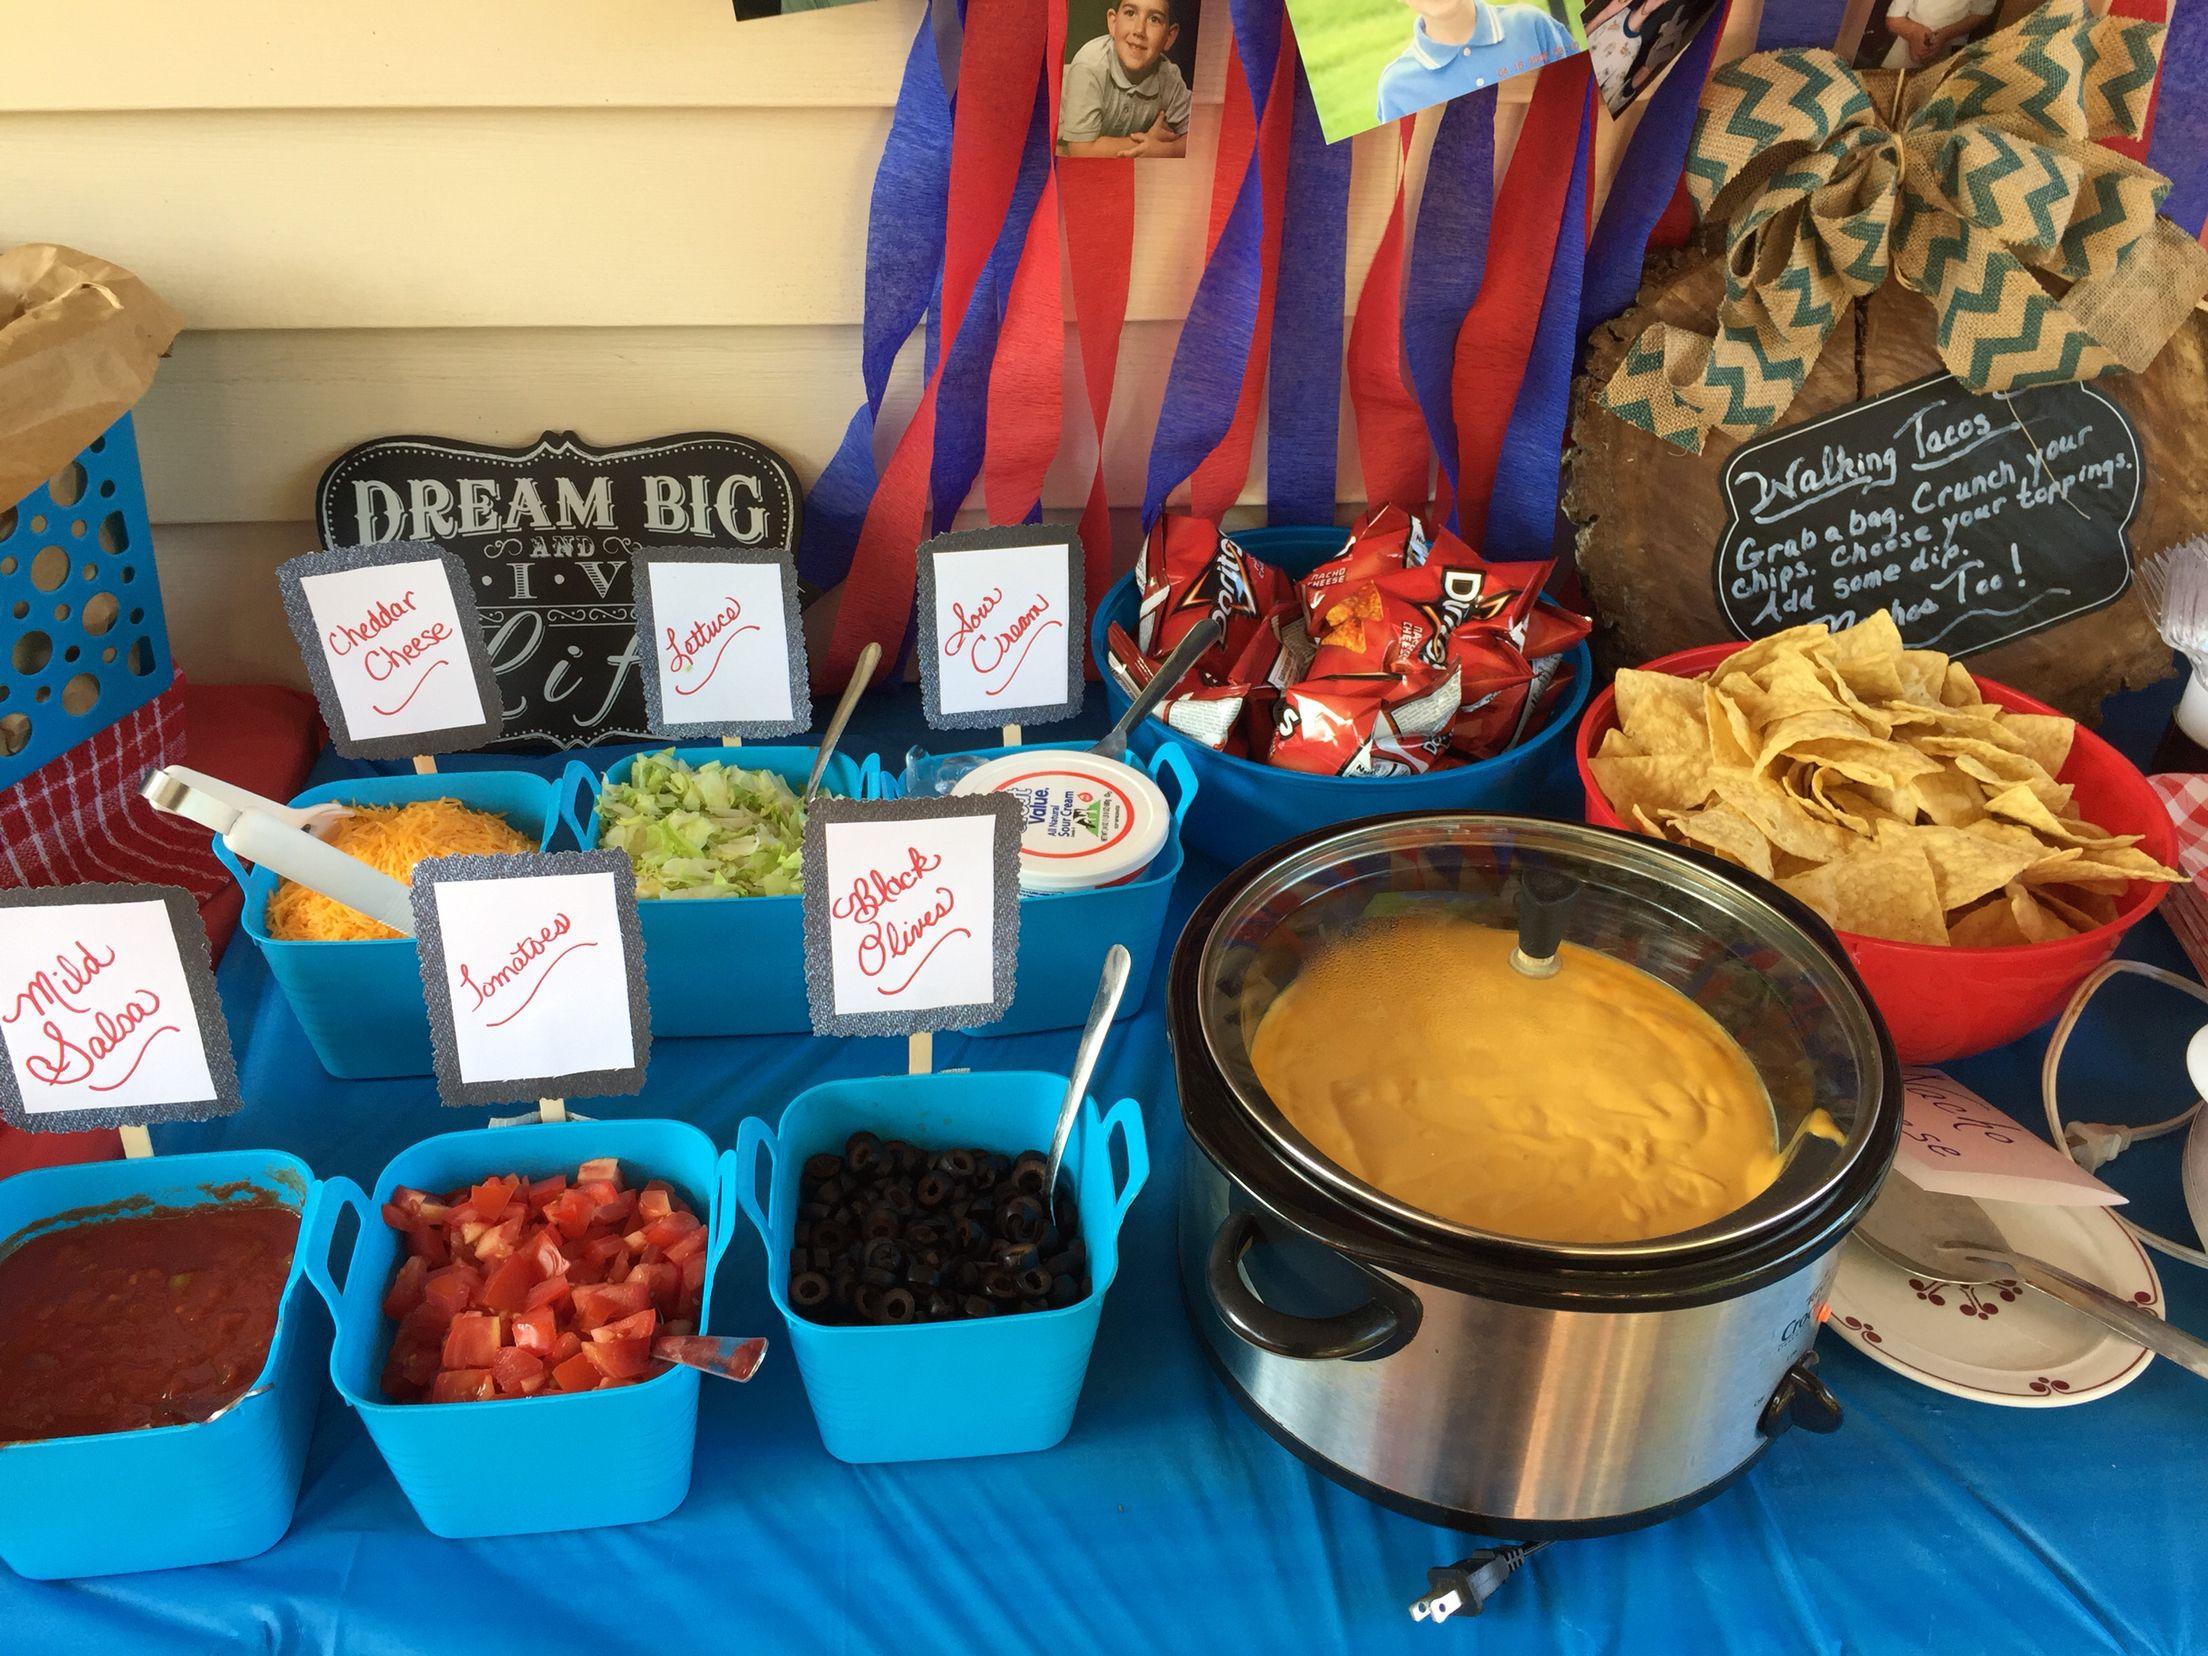 2017 05 potluck ideas for small groups - Walking Taco And Nacho Bar